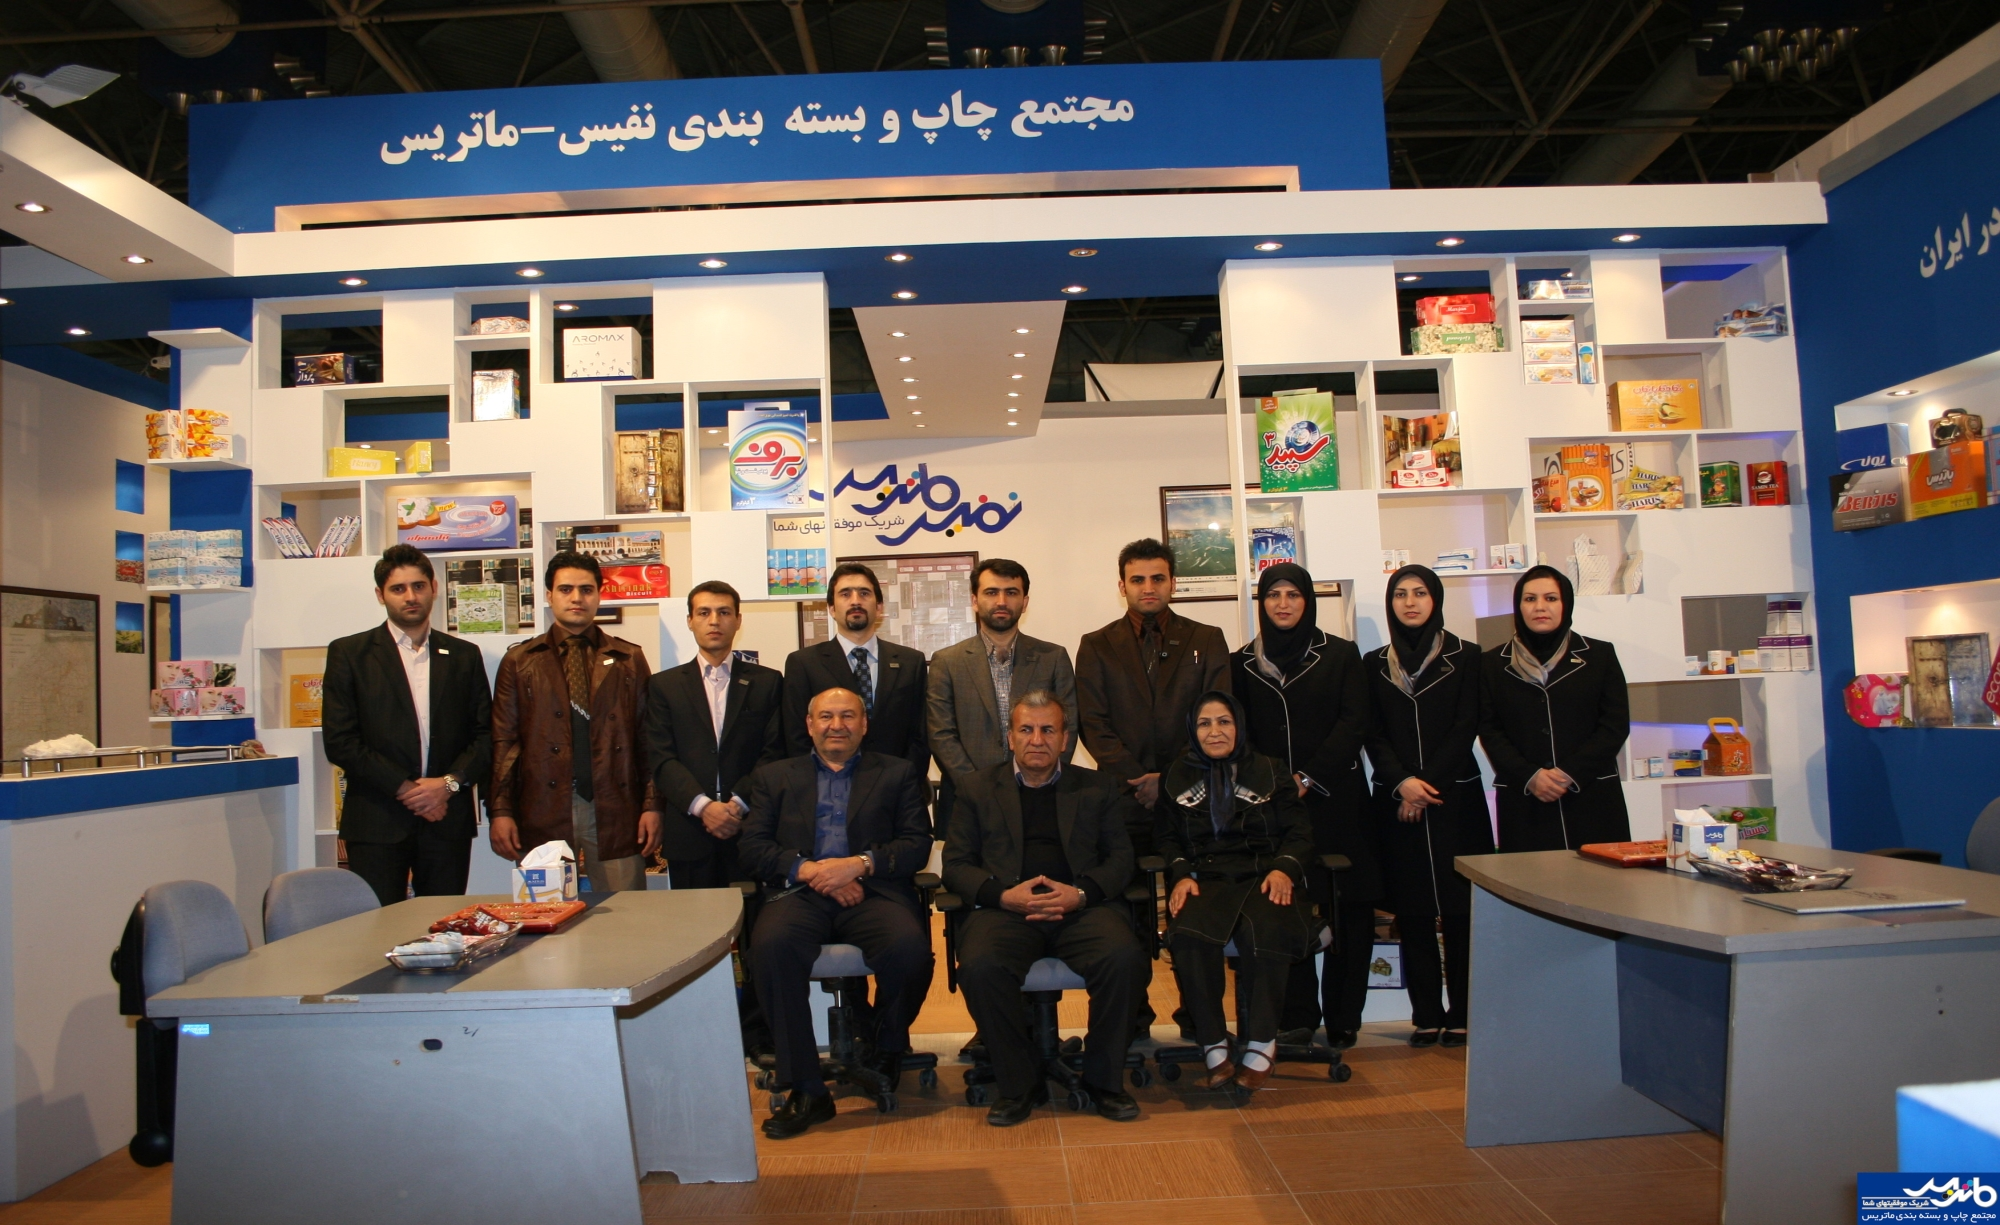 نمایشگاه صنعت چاپ؛ تهران-1390